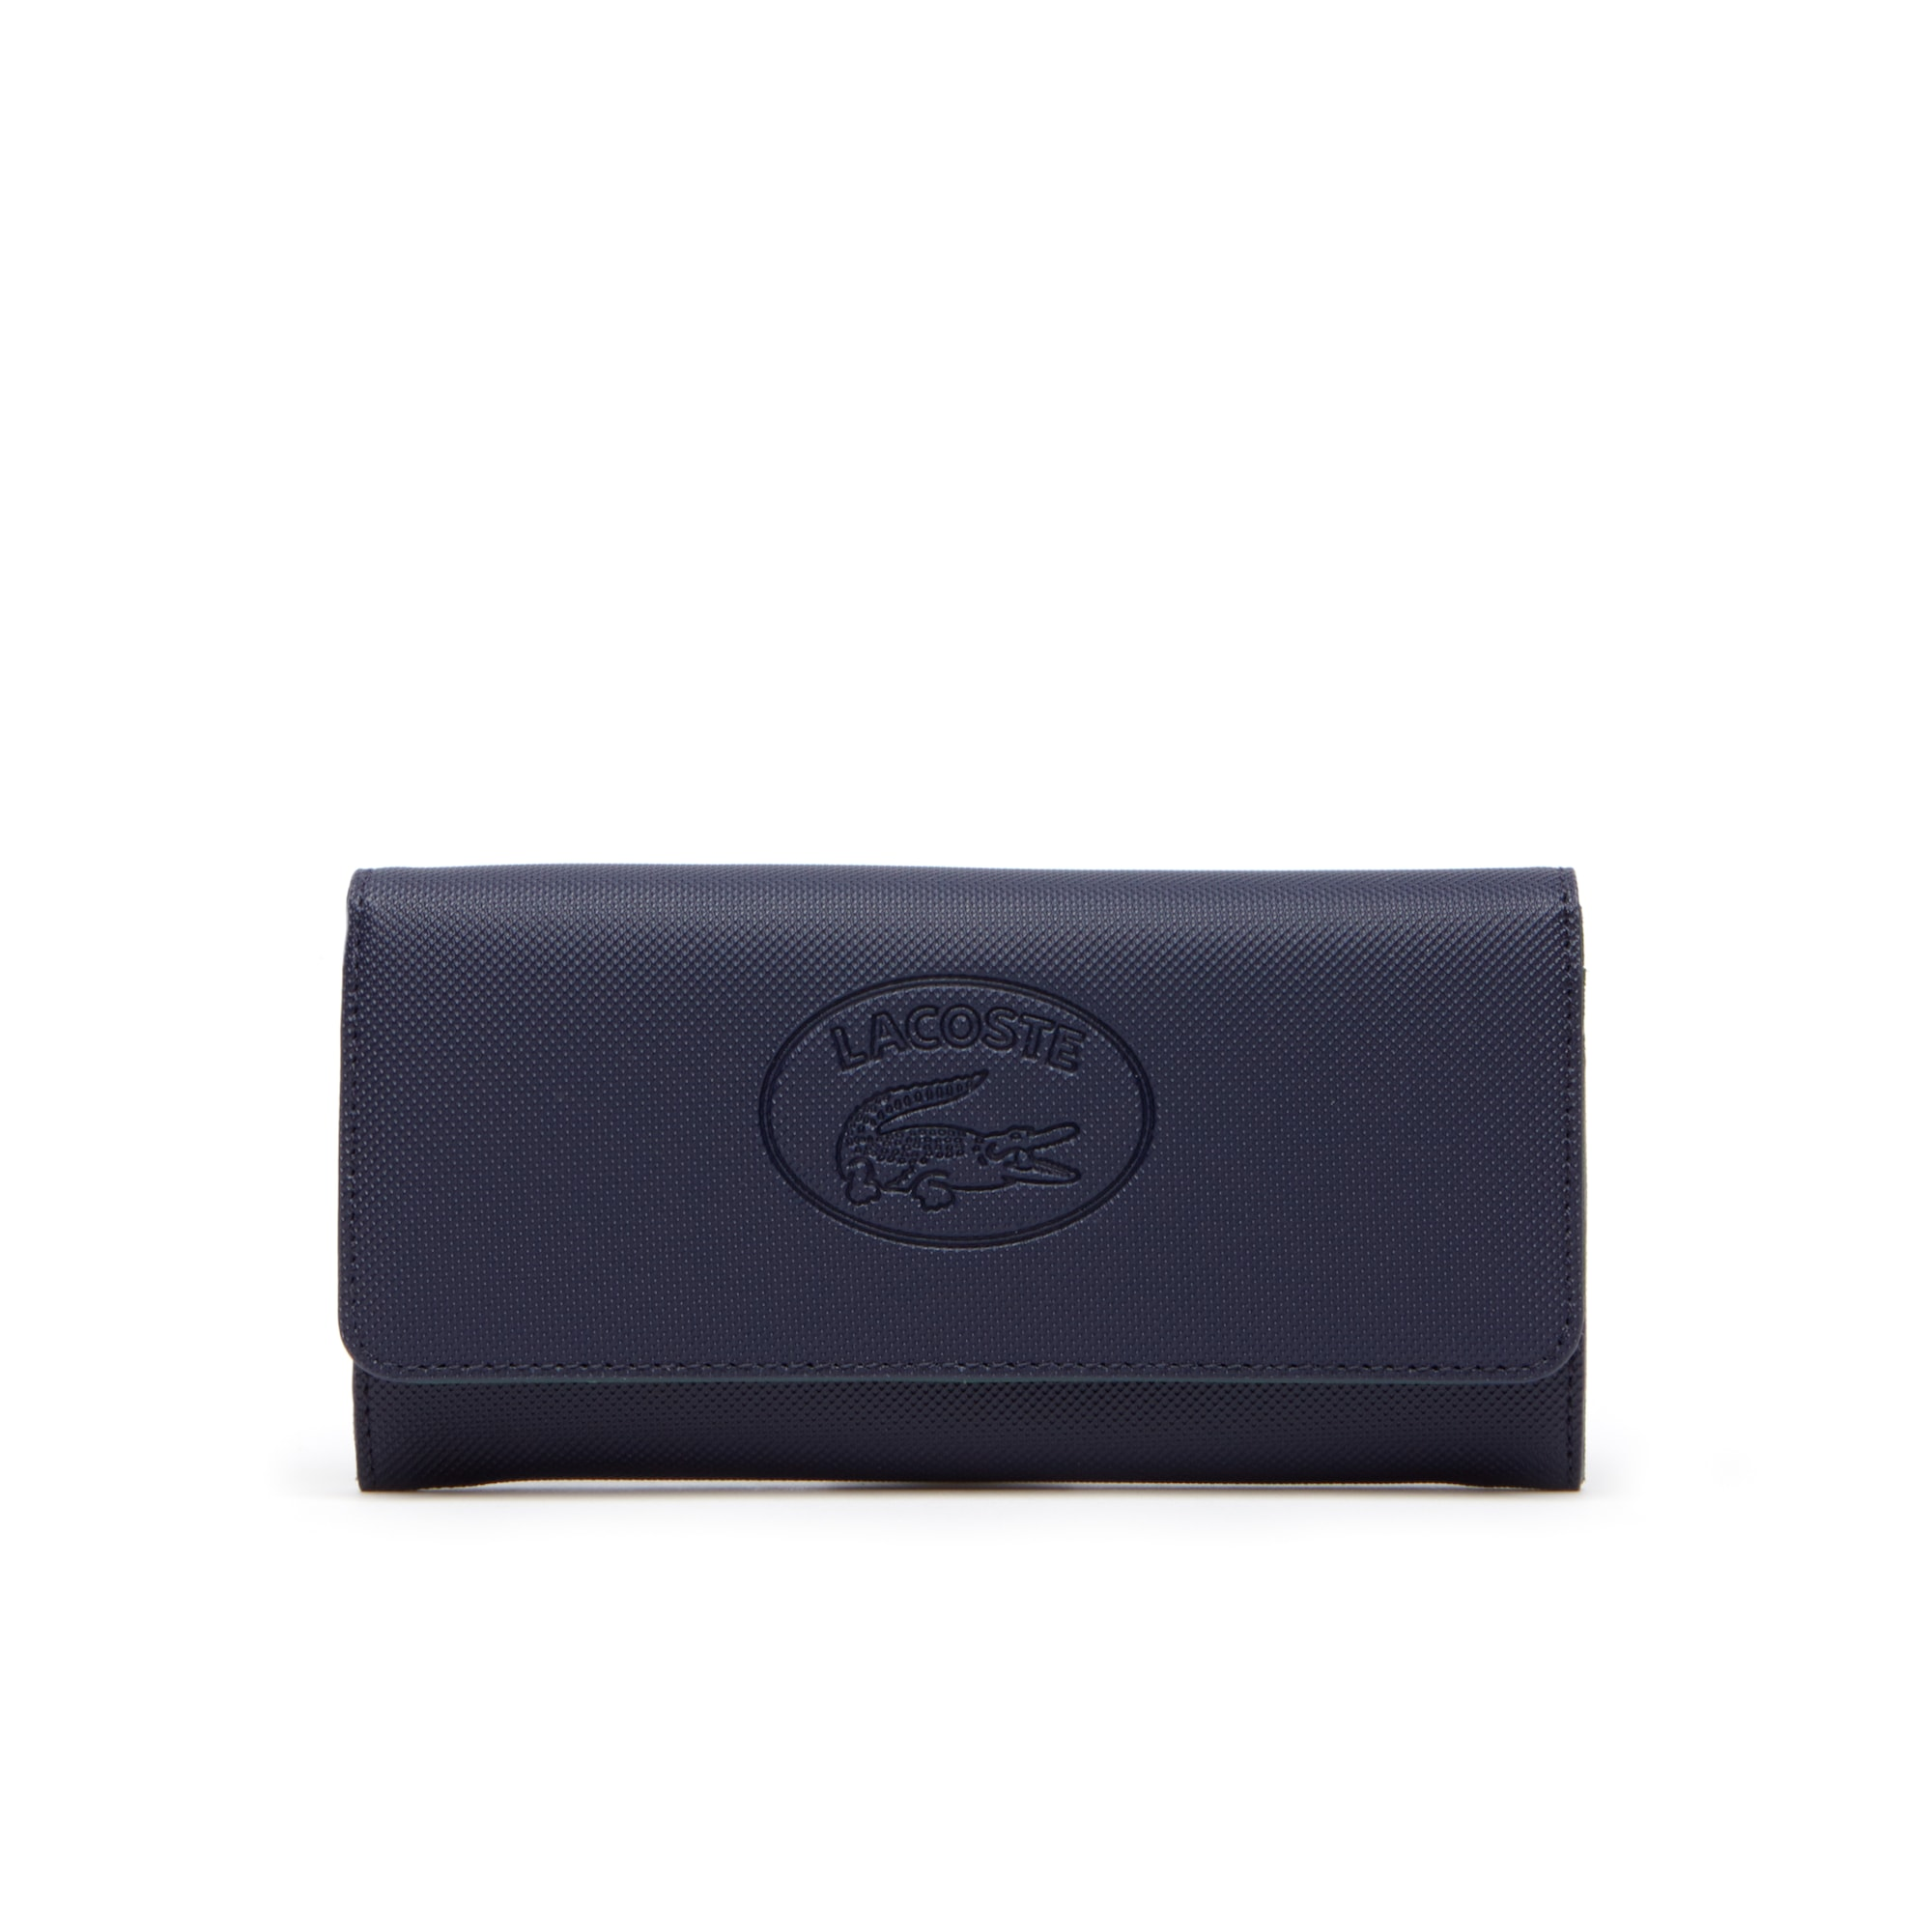 17b3a4e70 Women's Wallet & Phone Cases | Accessories | LACOSTE